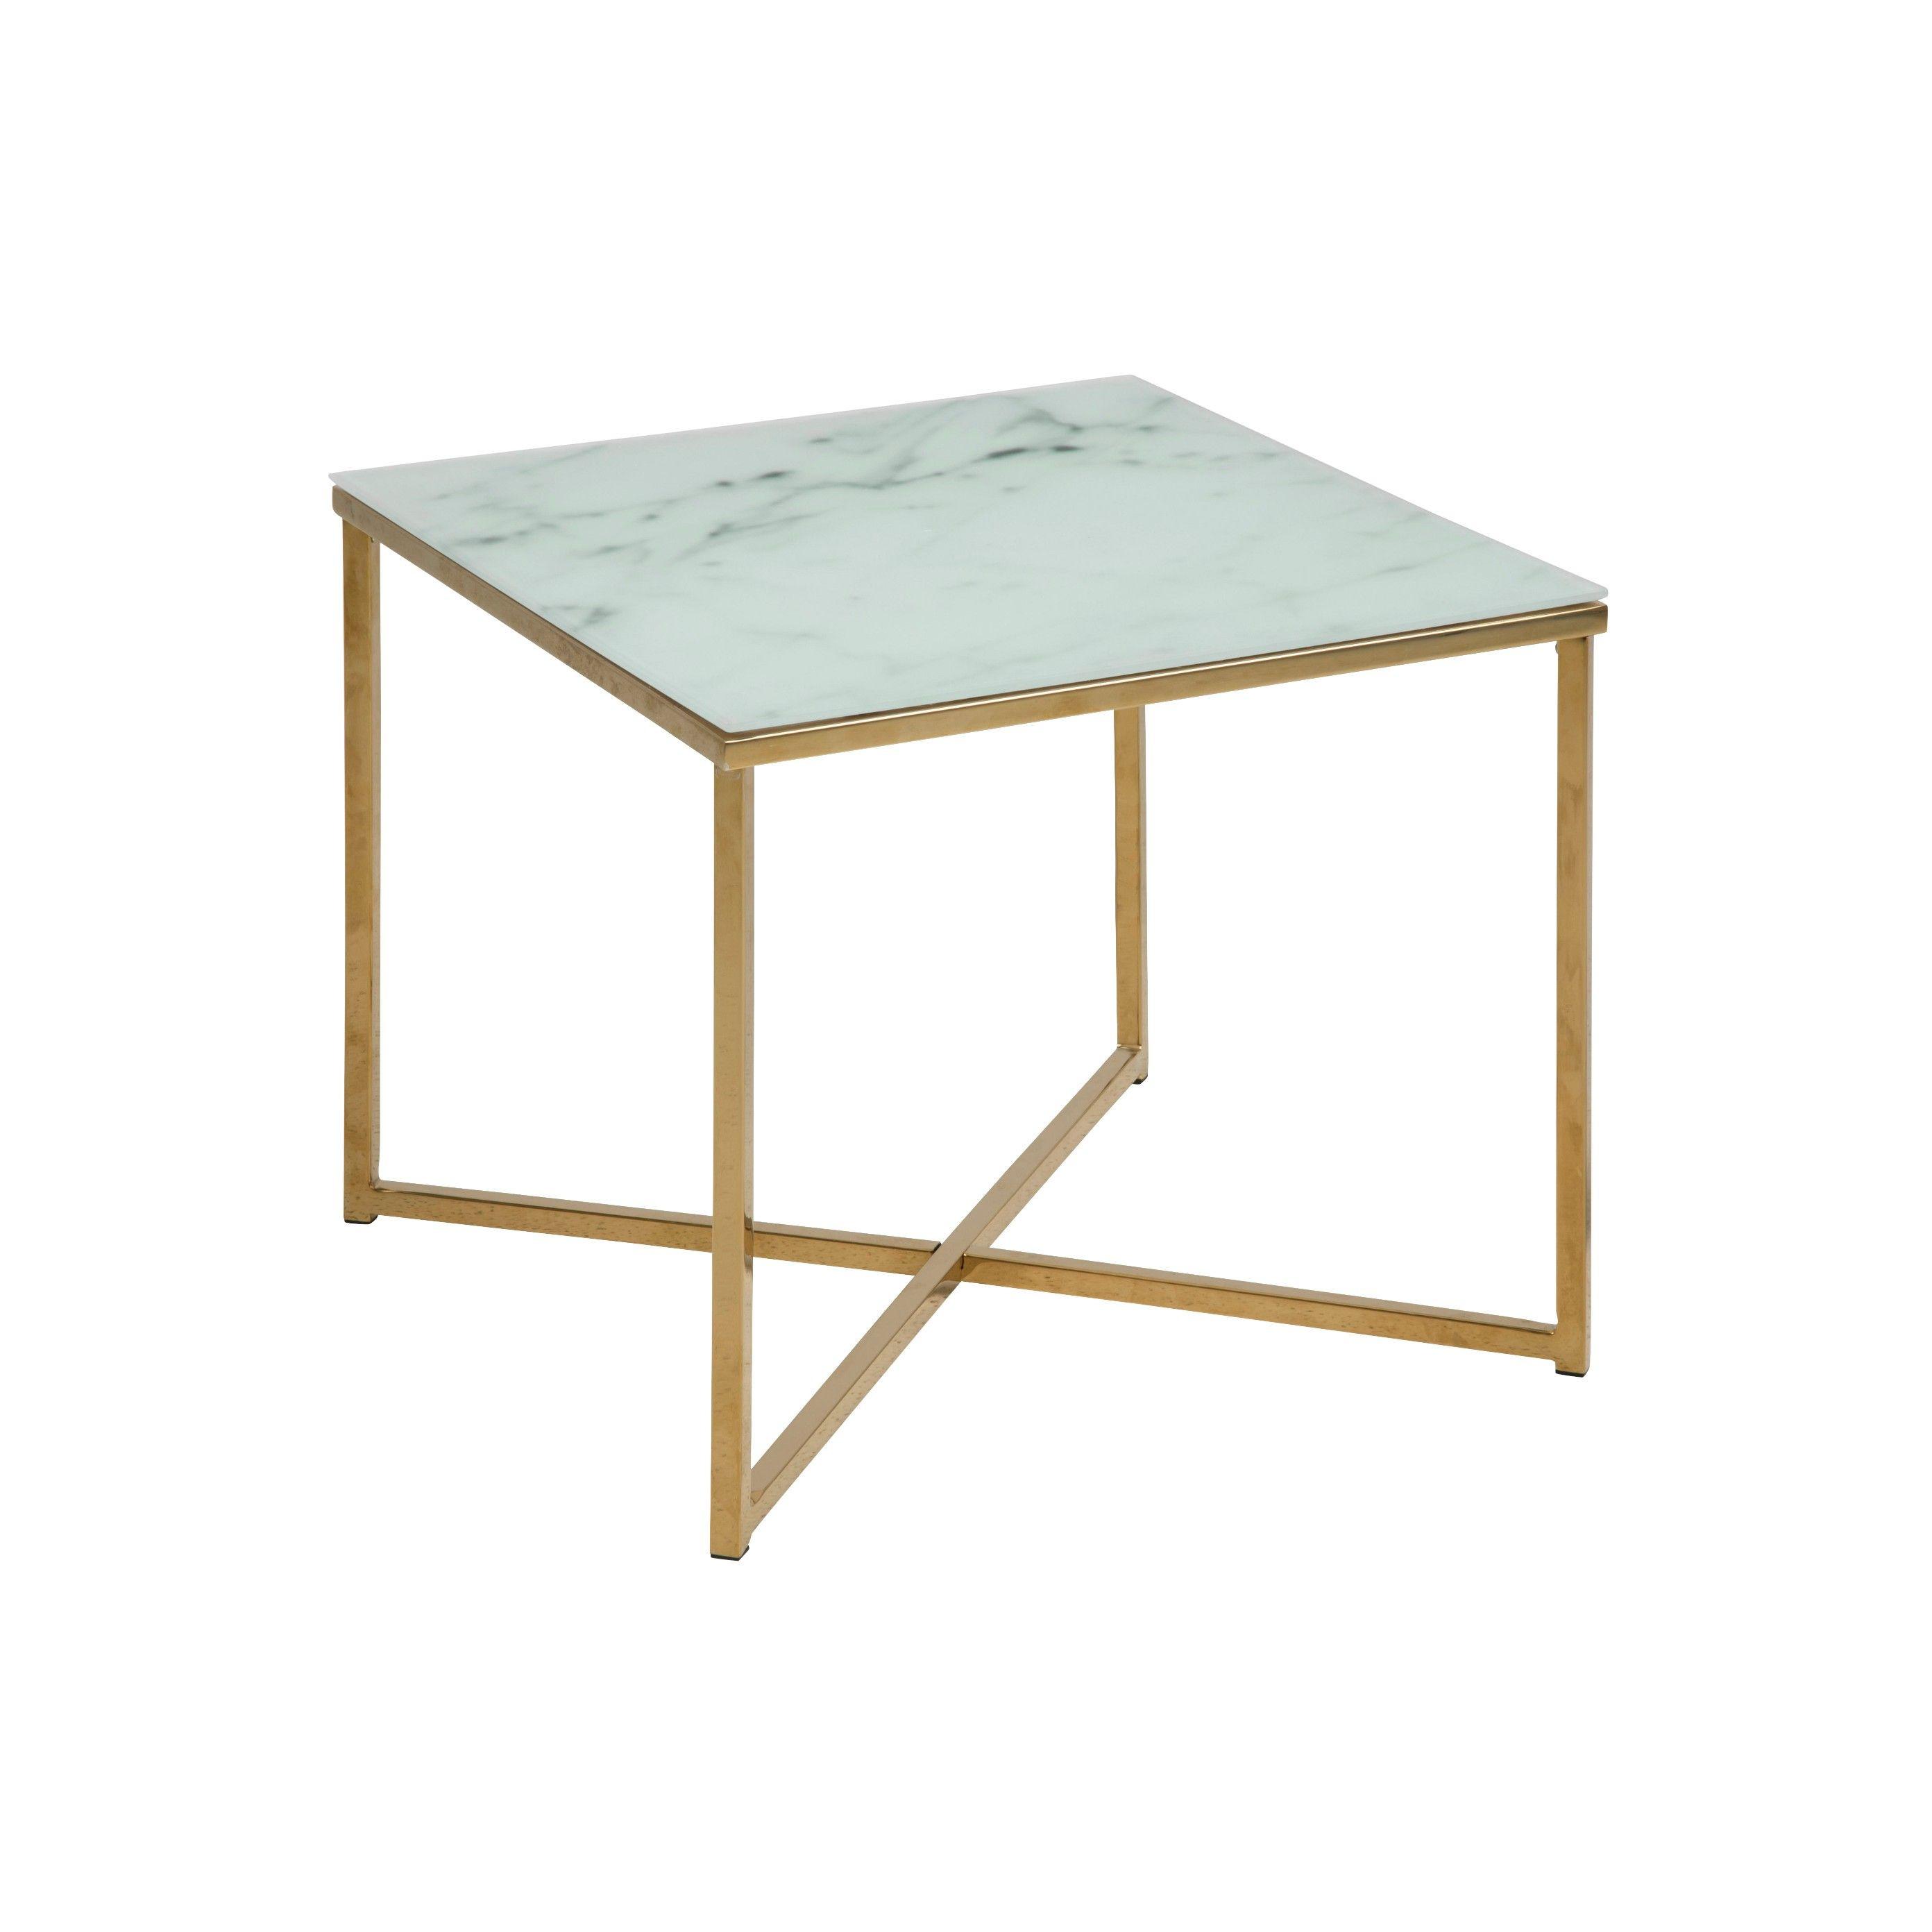 Ali Coffee Table 50 x 50 | White Marble